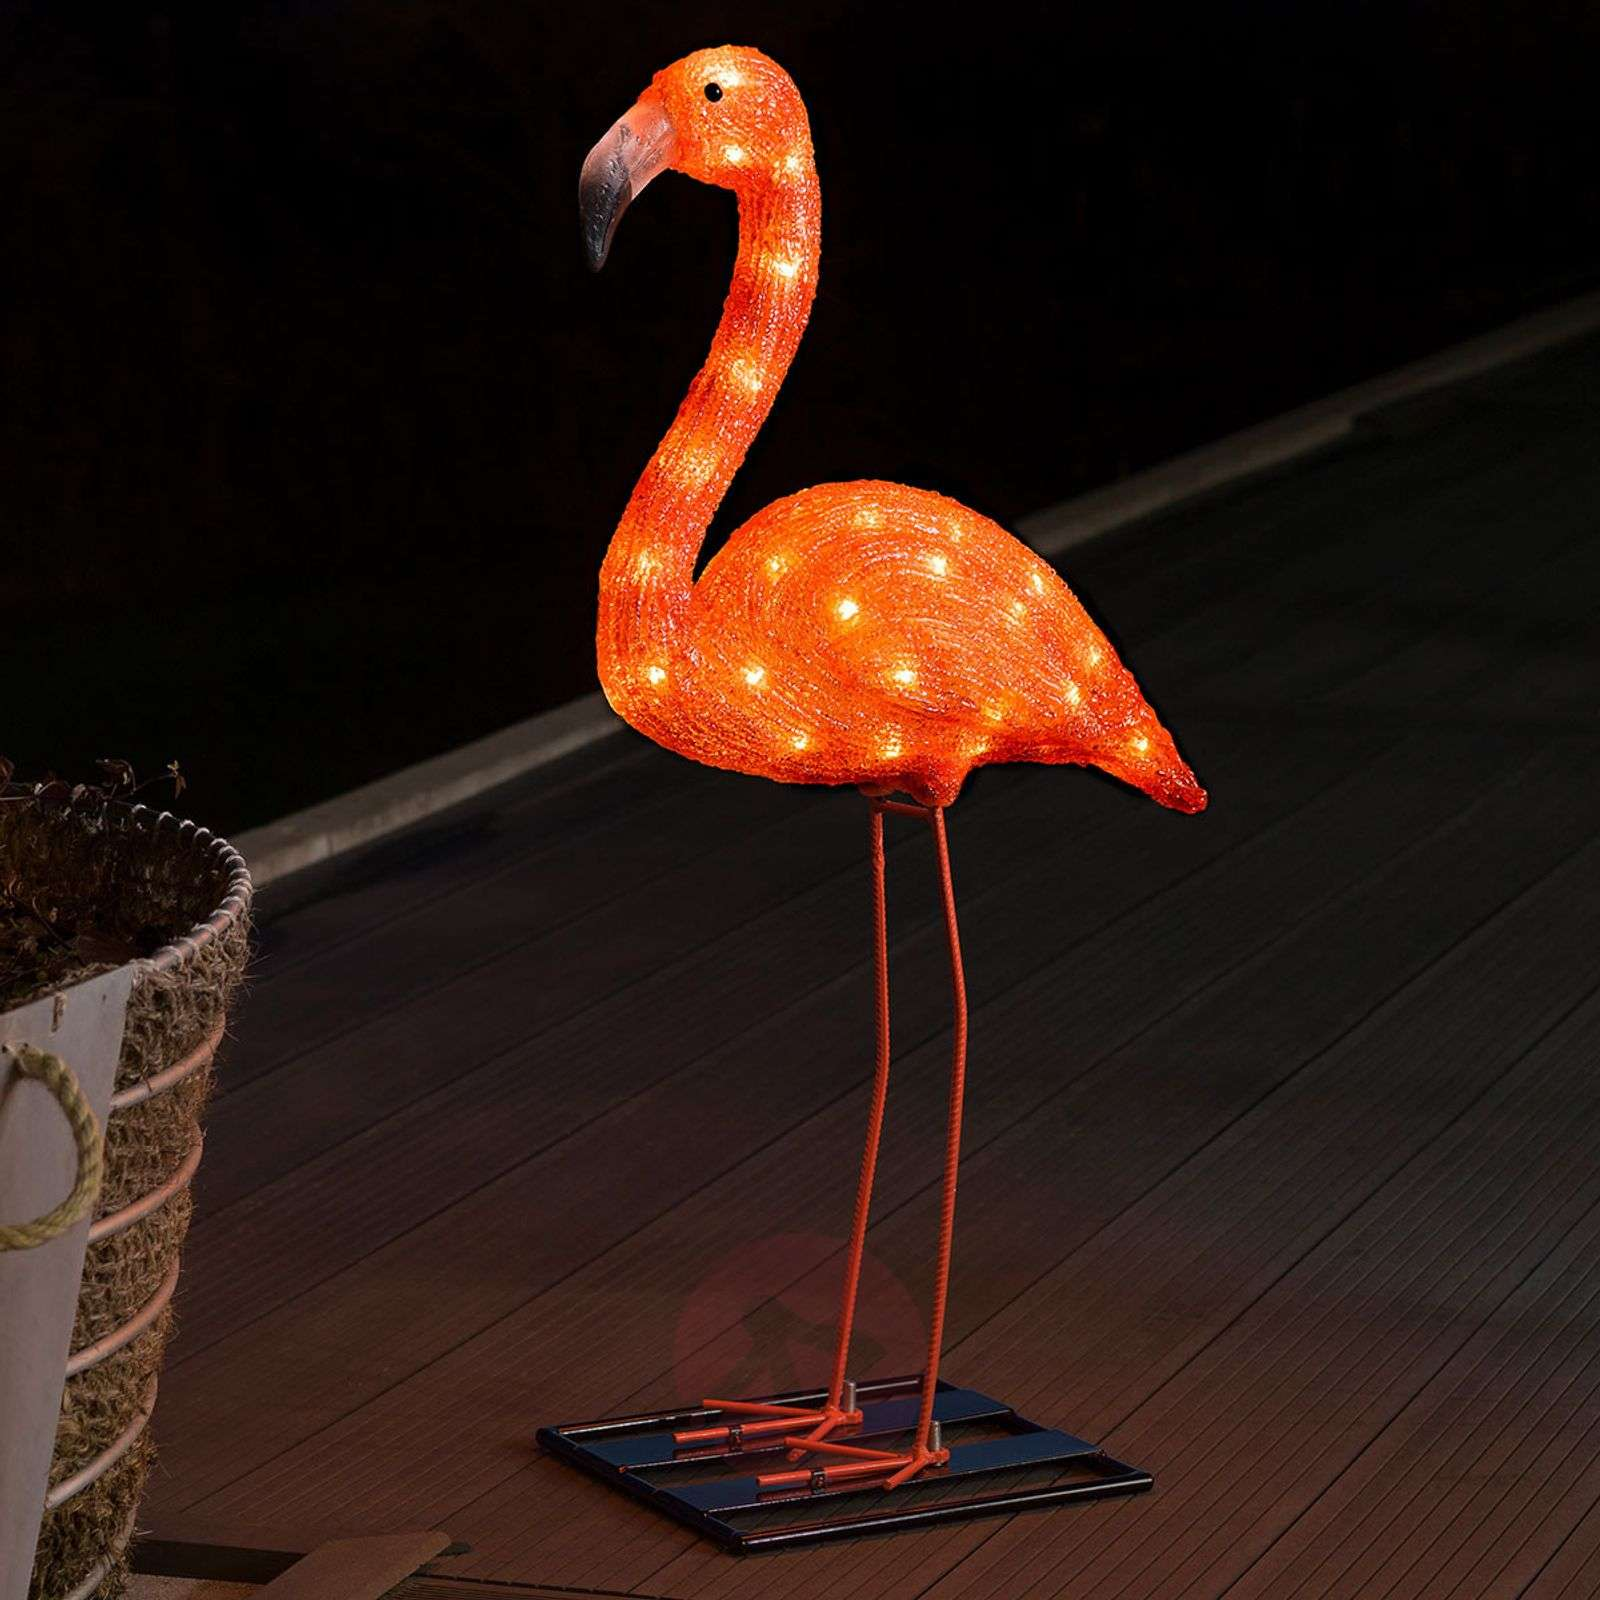 LED-koristevalaisin Flamingo 65cm-5524874-01